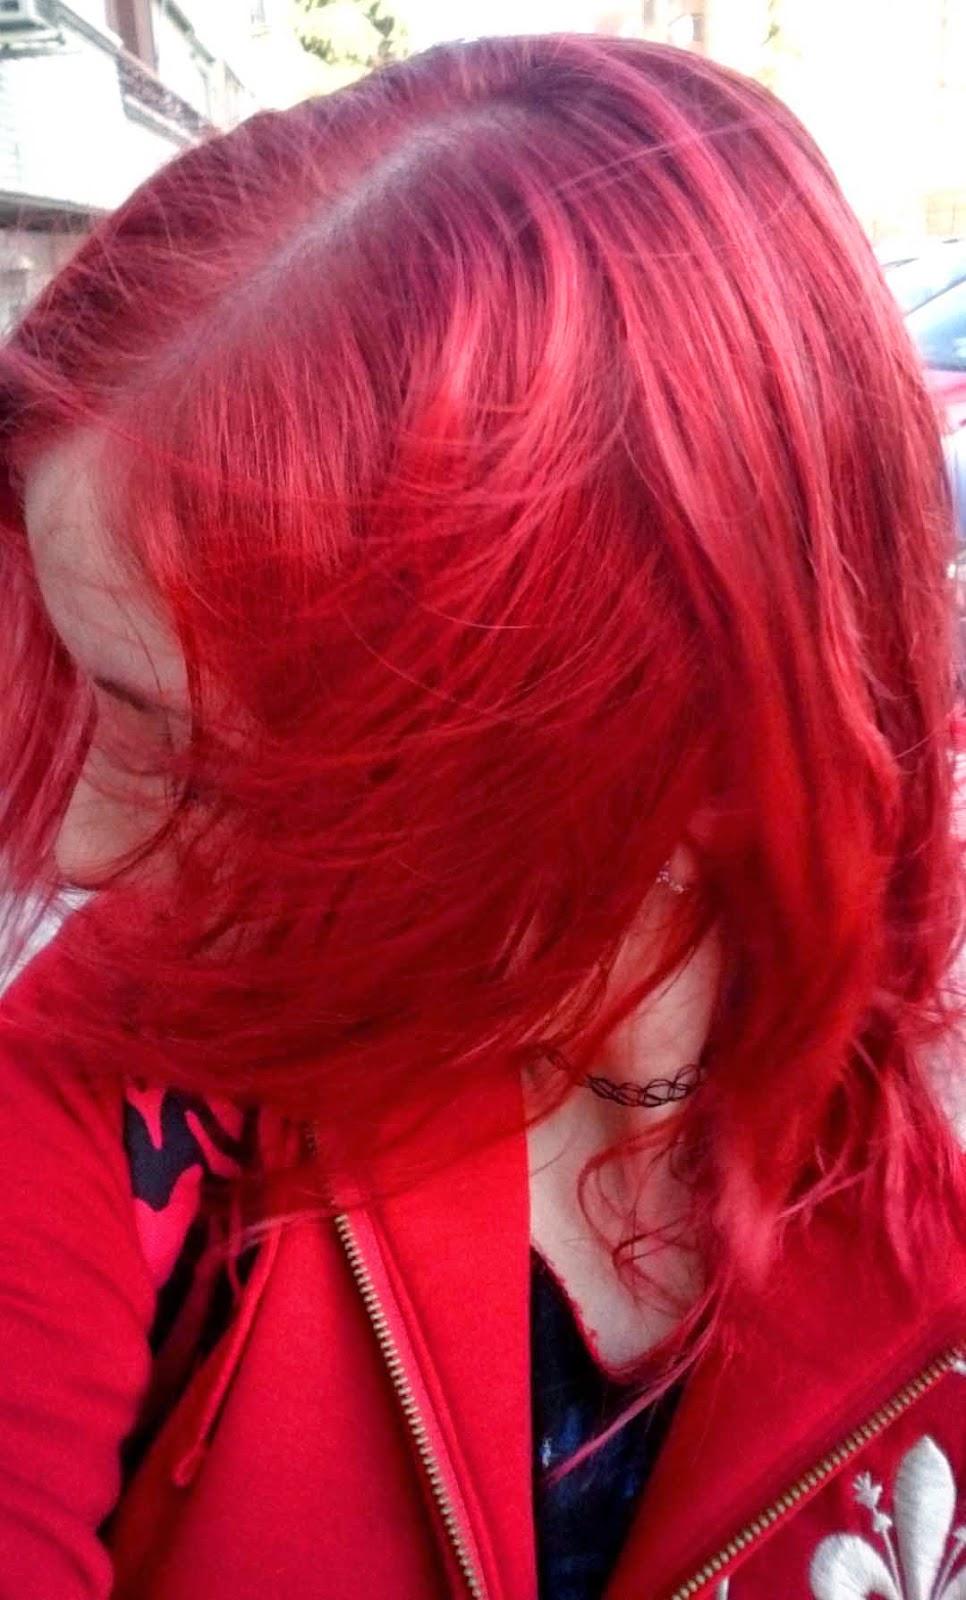 cabello extra rojo intenso